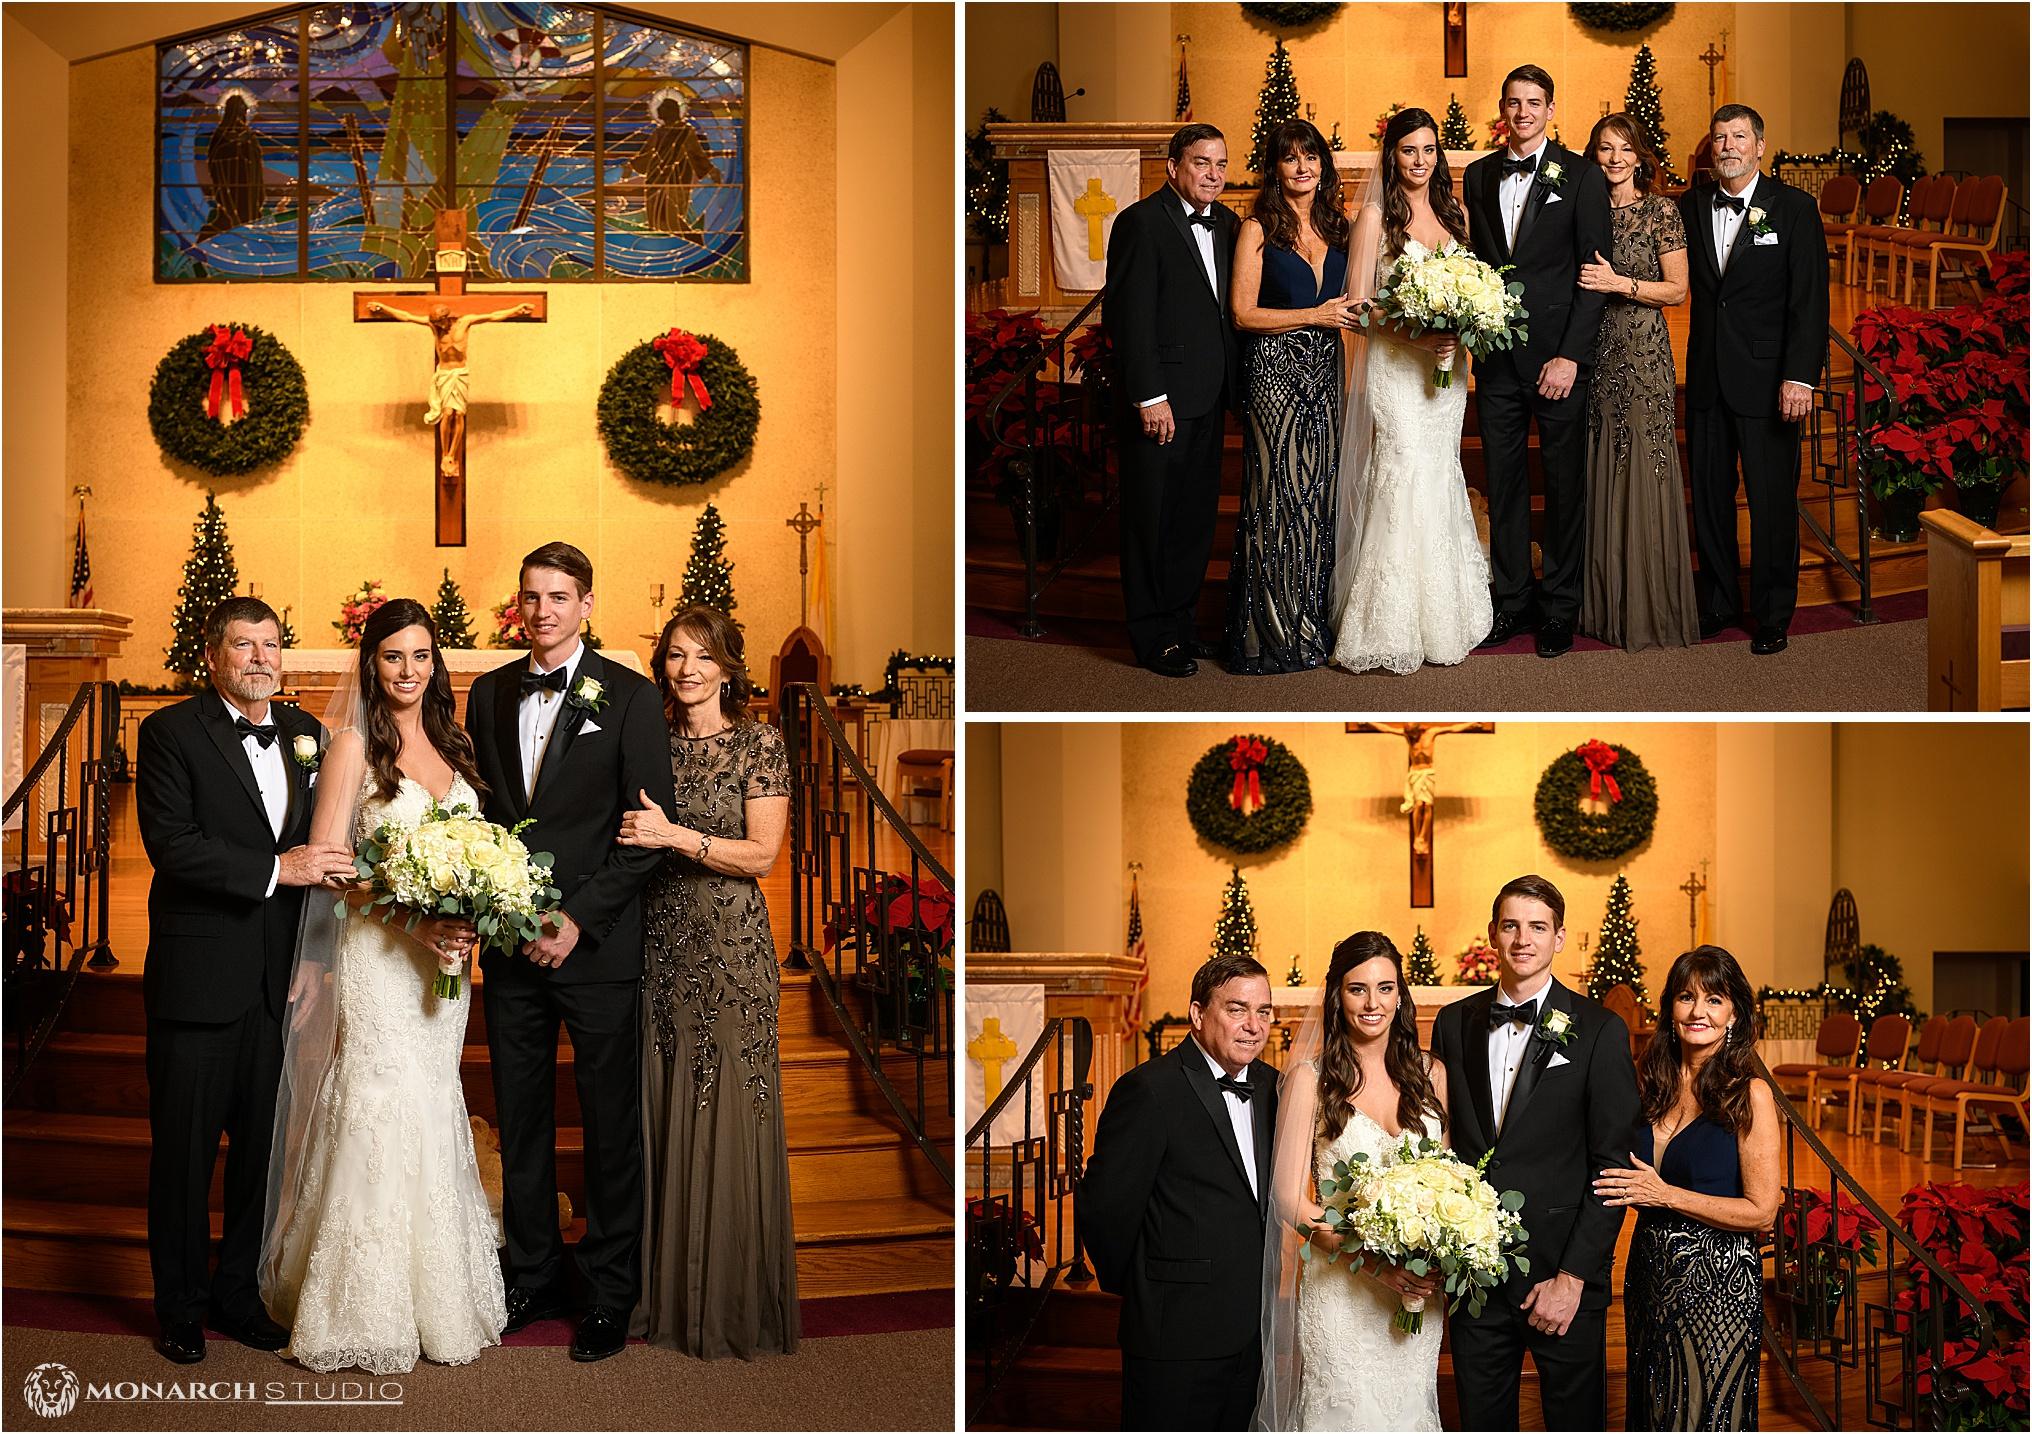 saint-augustine-wedding-photographer-treasury-056.jpg